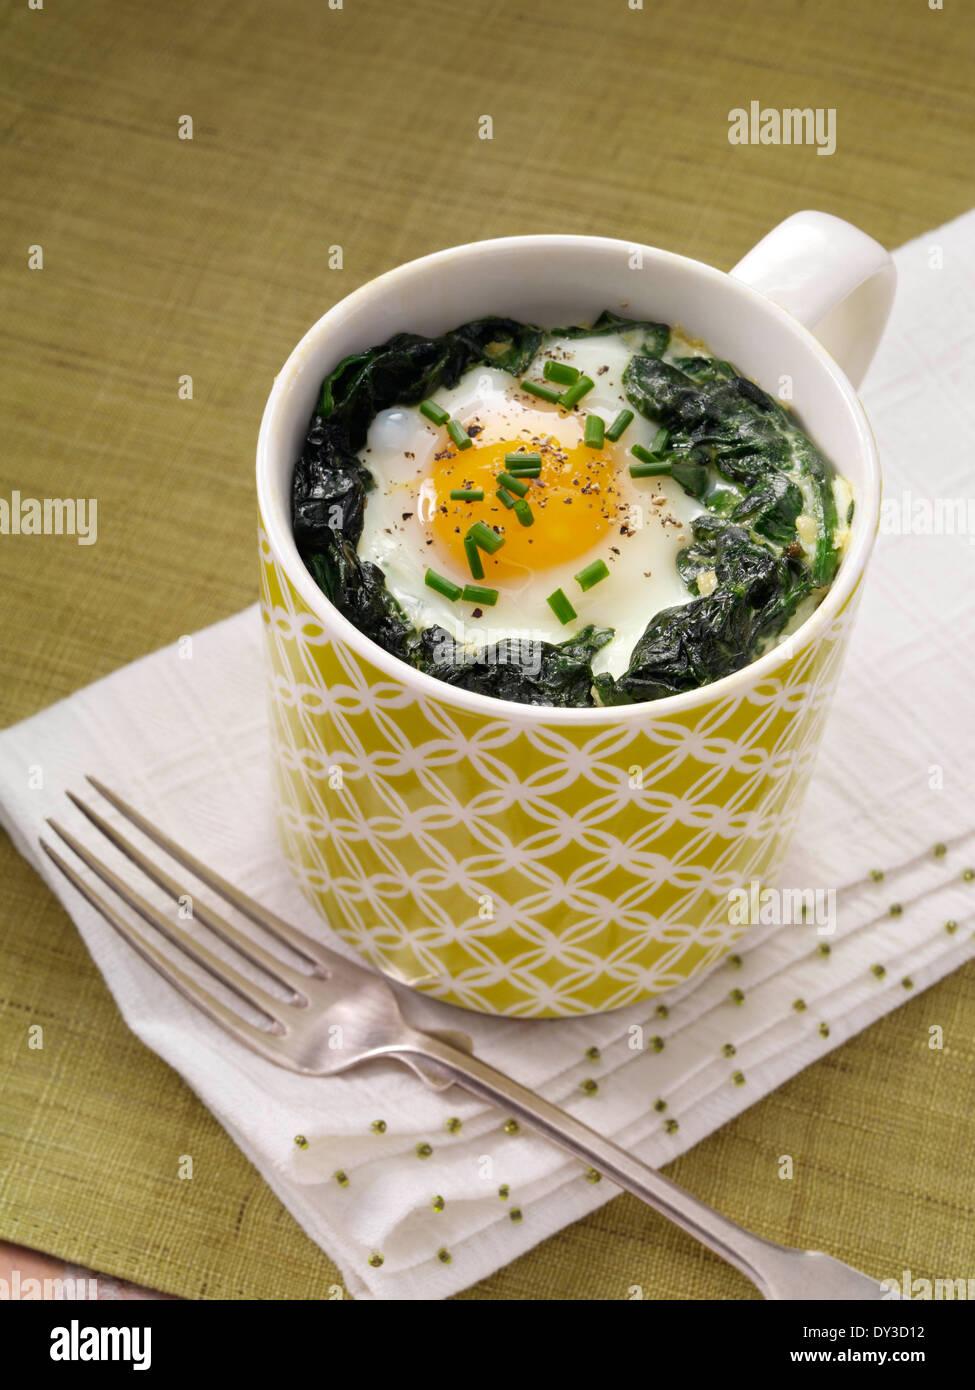 Eggs Florentine - Stock Image